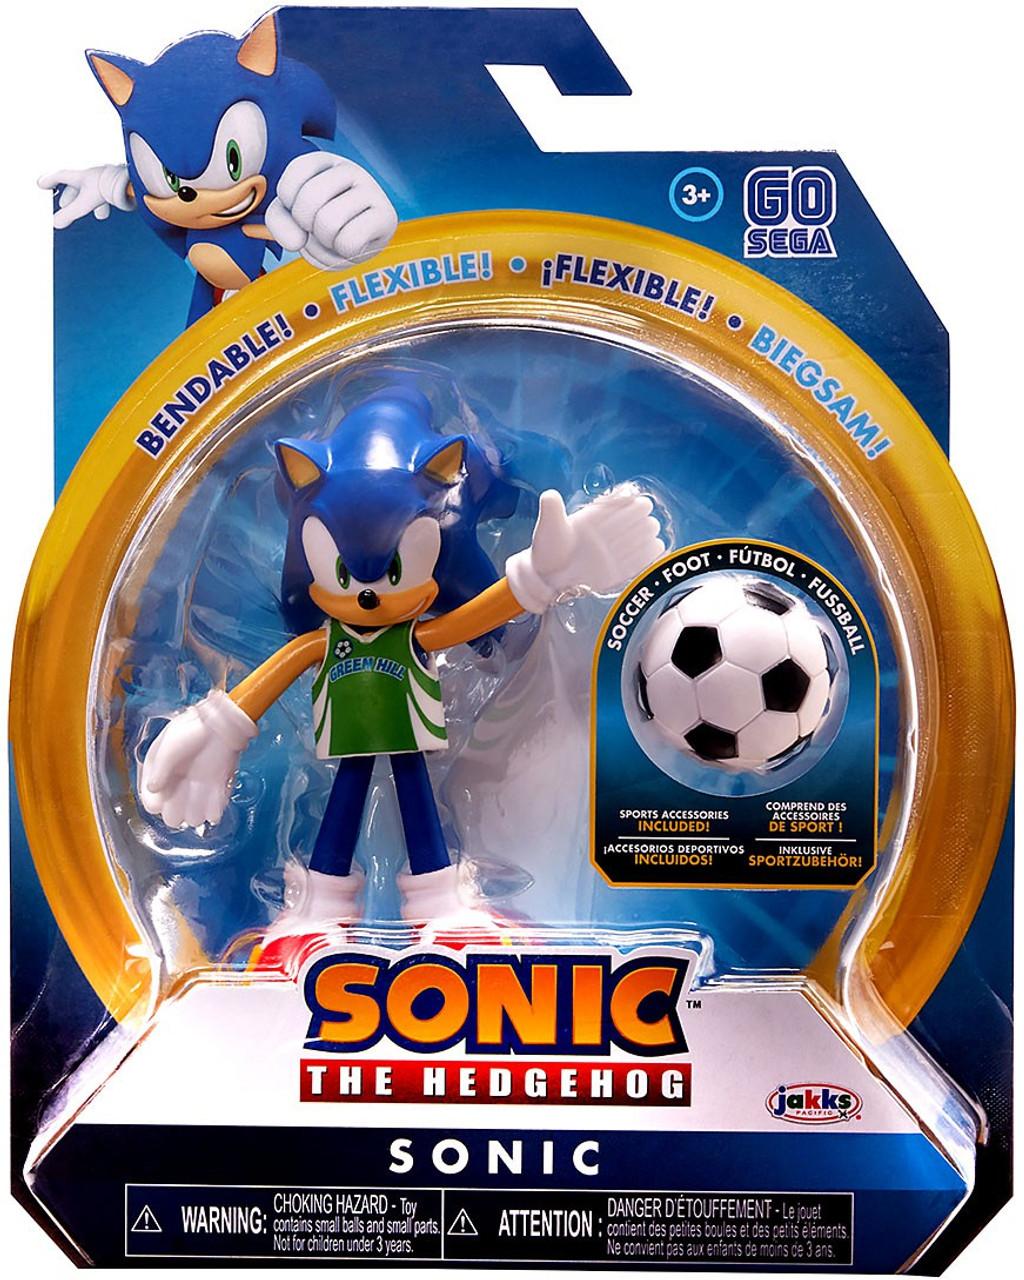 Sonic The Hedgehog Basic Series 3 Soccer Sonic 4 Action Figure Jakks Pacific Toywiz